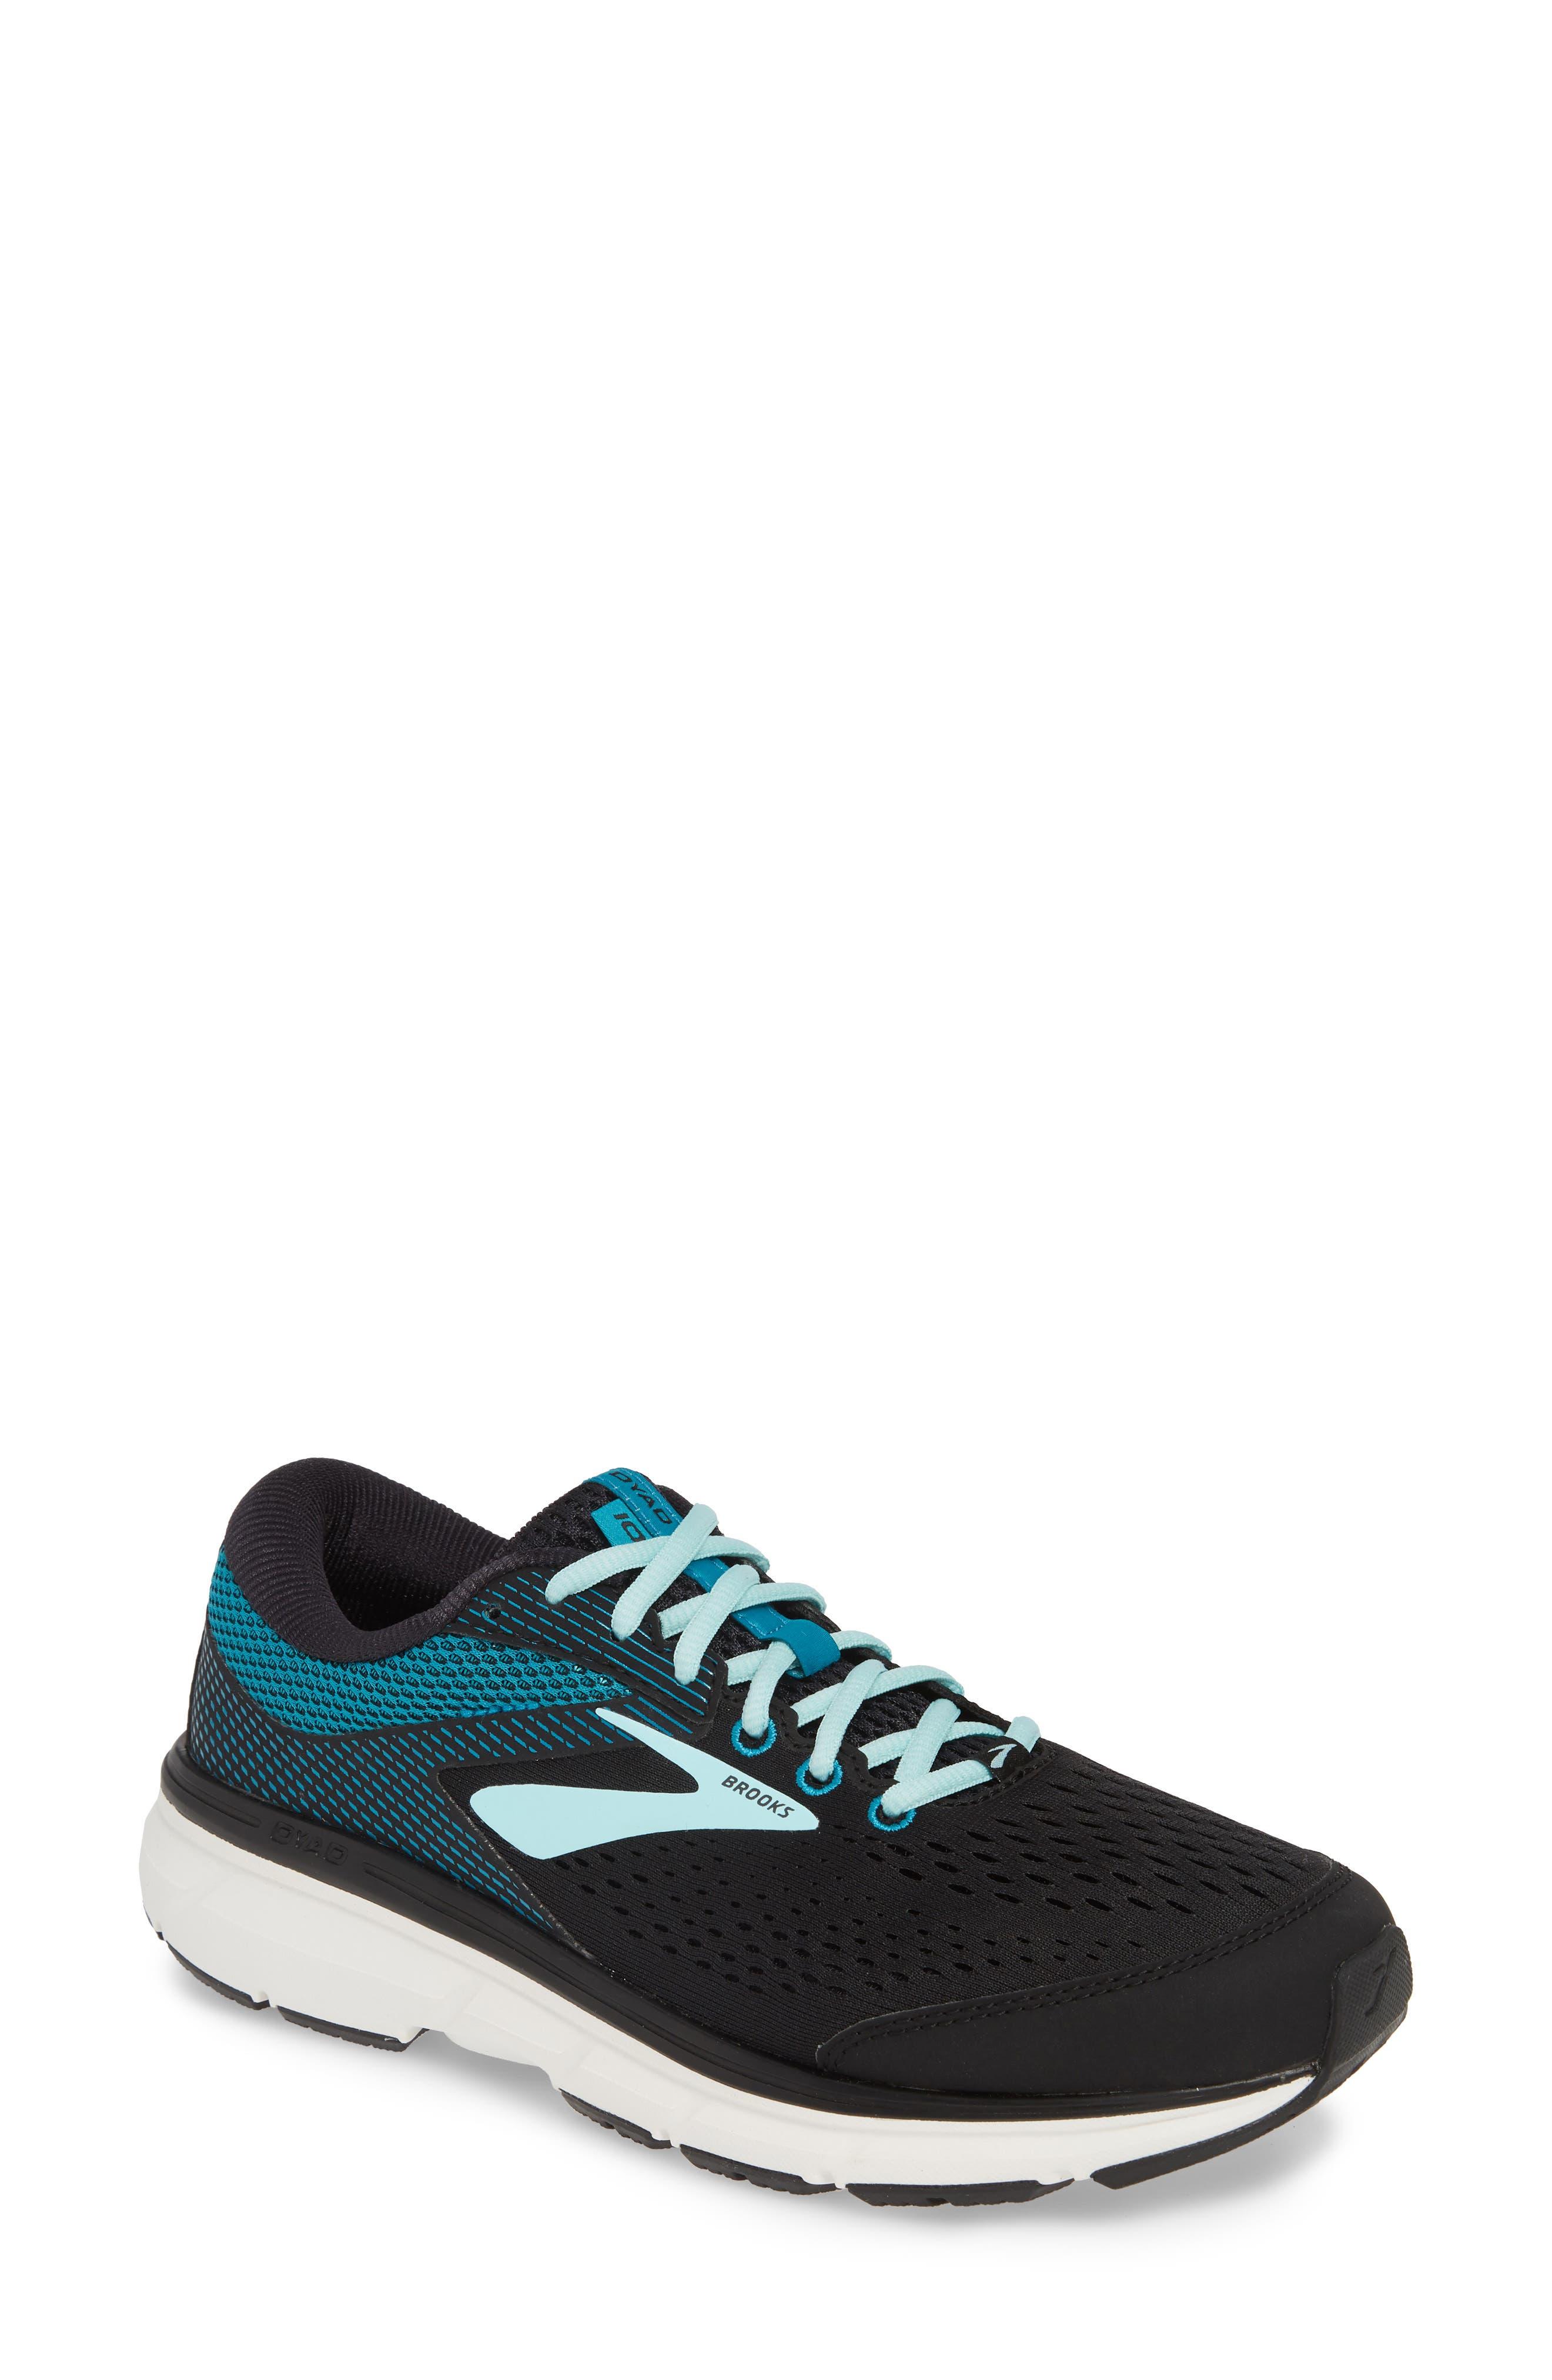 Brooks Dyad 10 Running Shoe - Black